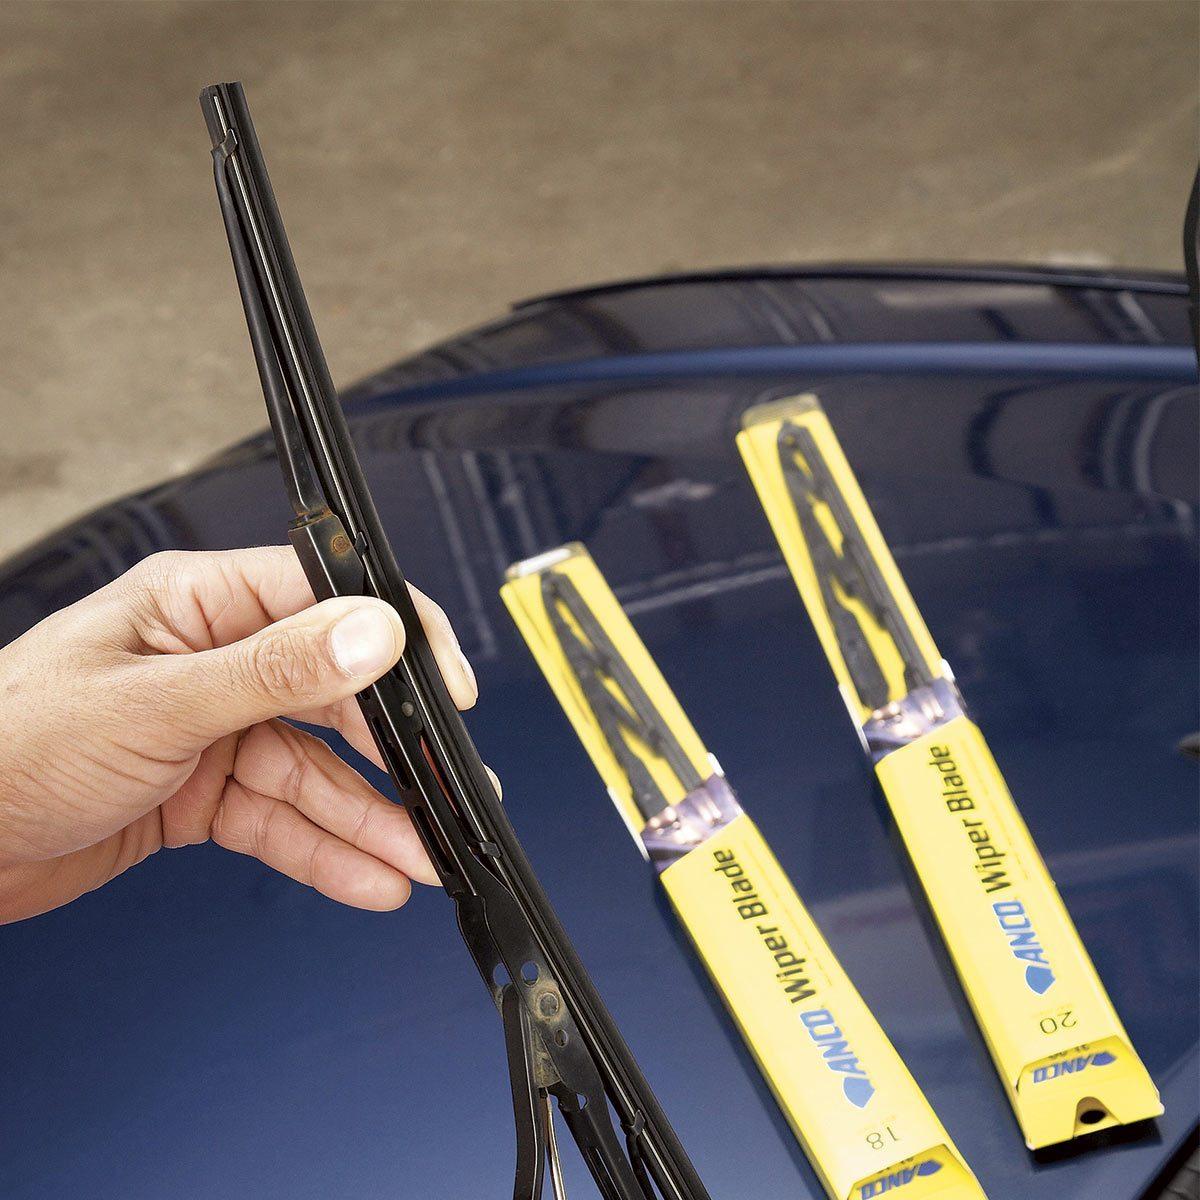 Worn windshield wipers